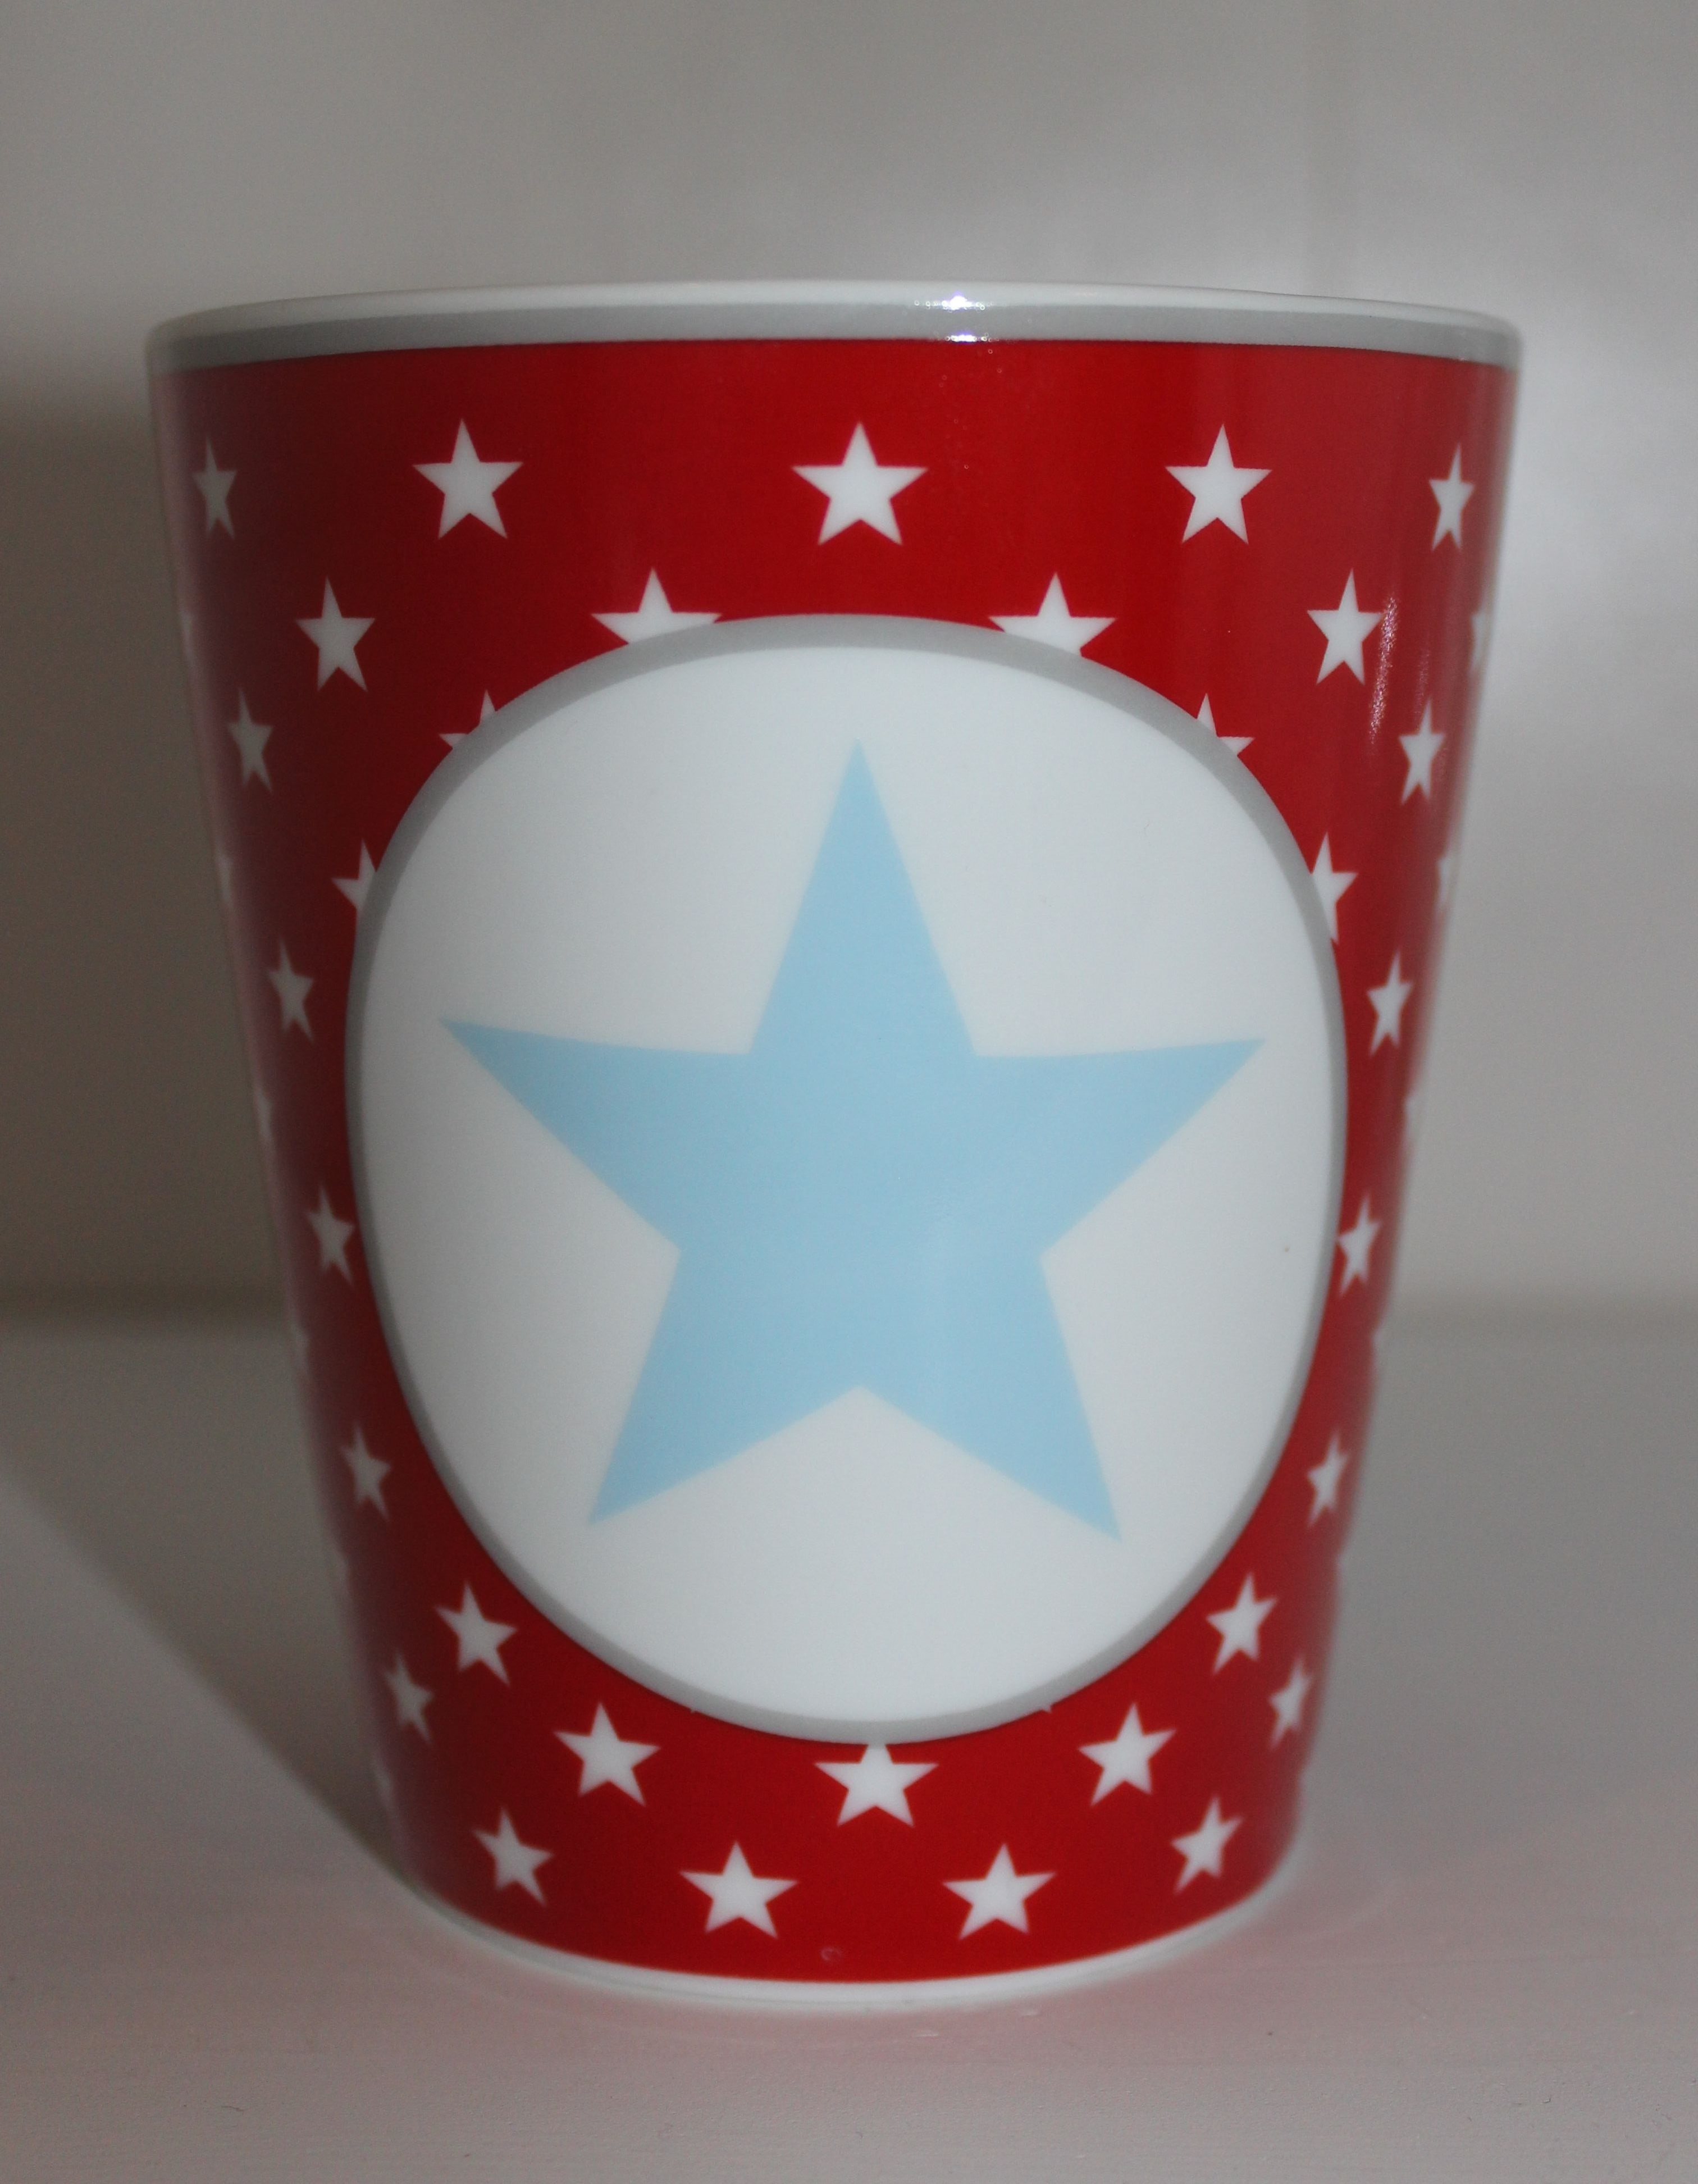 Mug Kaffeebecher rot mit hellblauem Stern